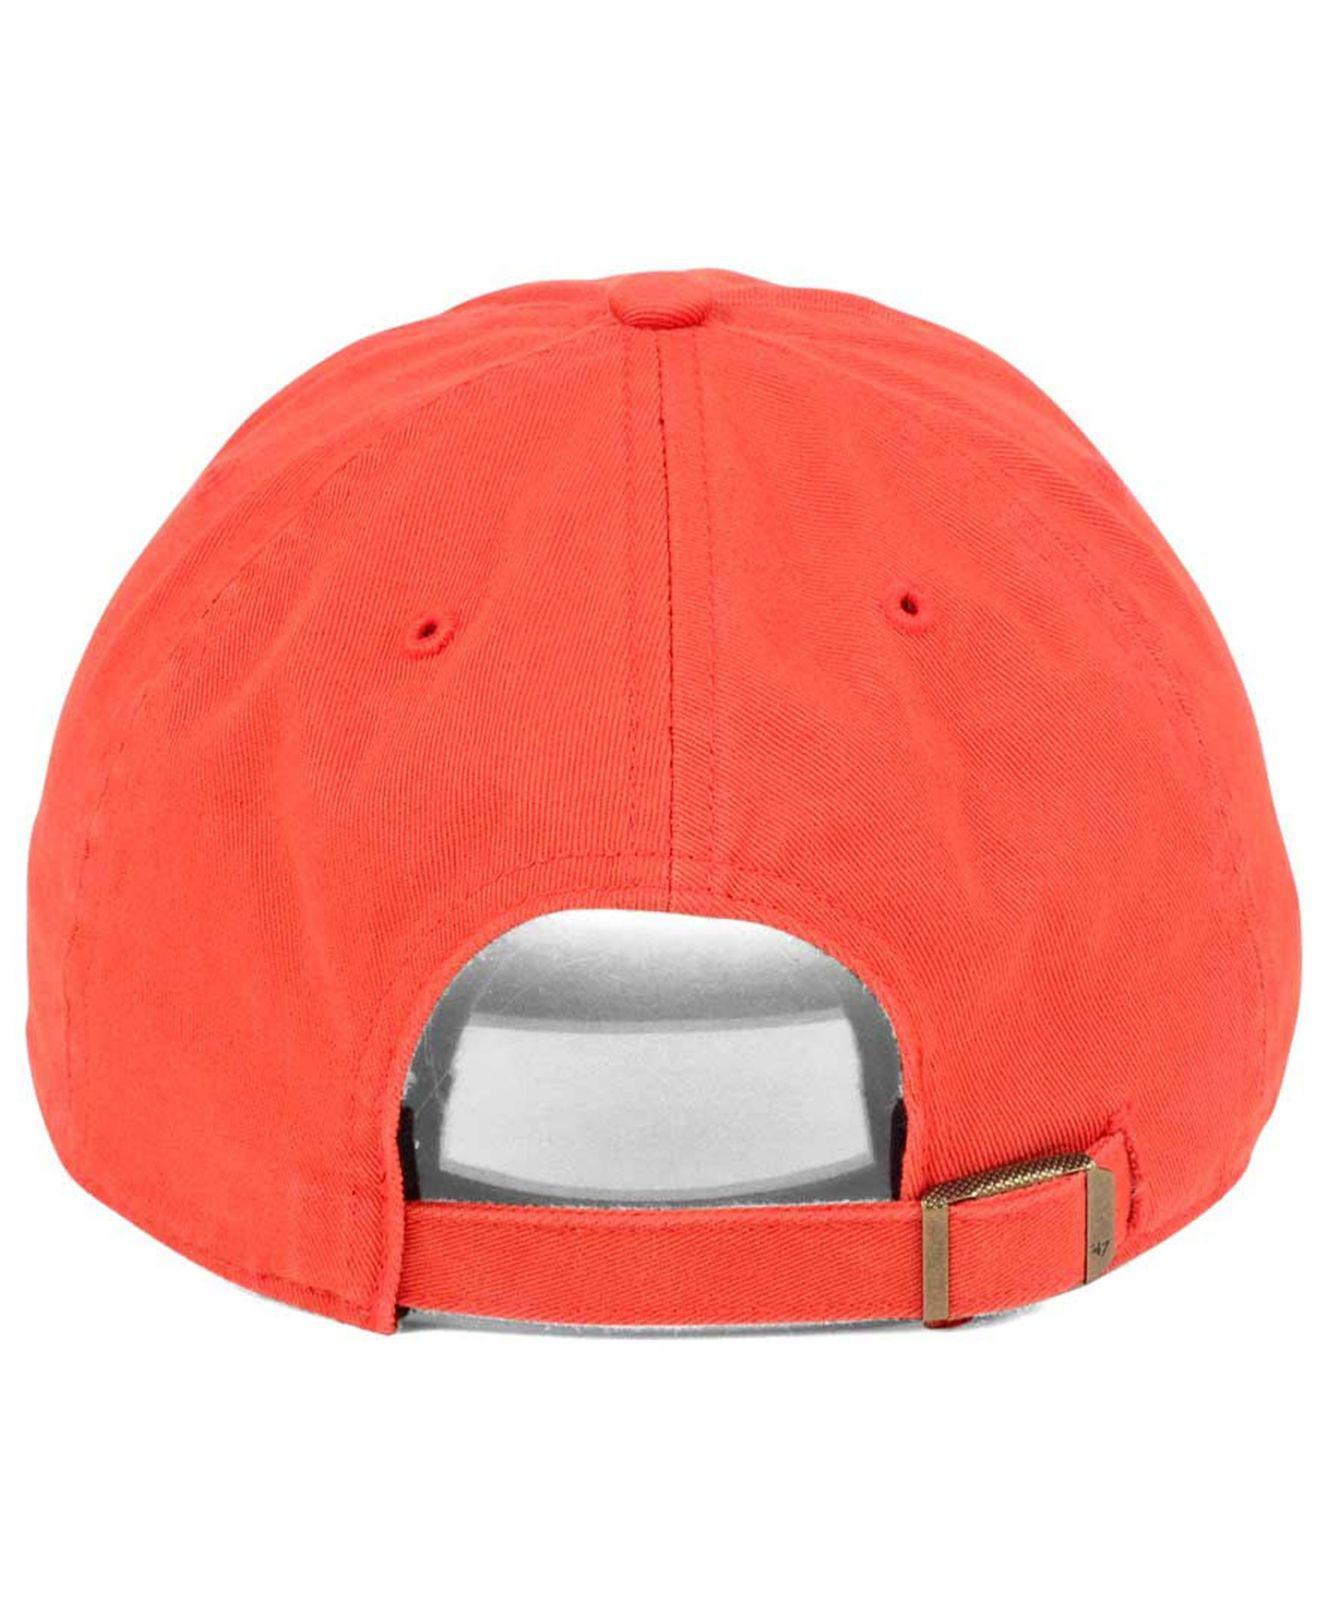 free shipping 6e773 beb7c Lyst - 47 Brand Triple Rush Clean Up Cap in Orange for Men